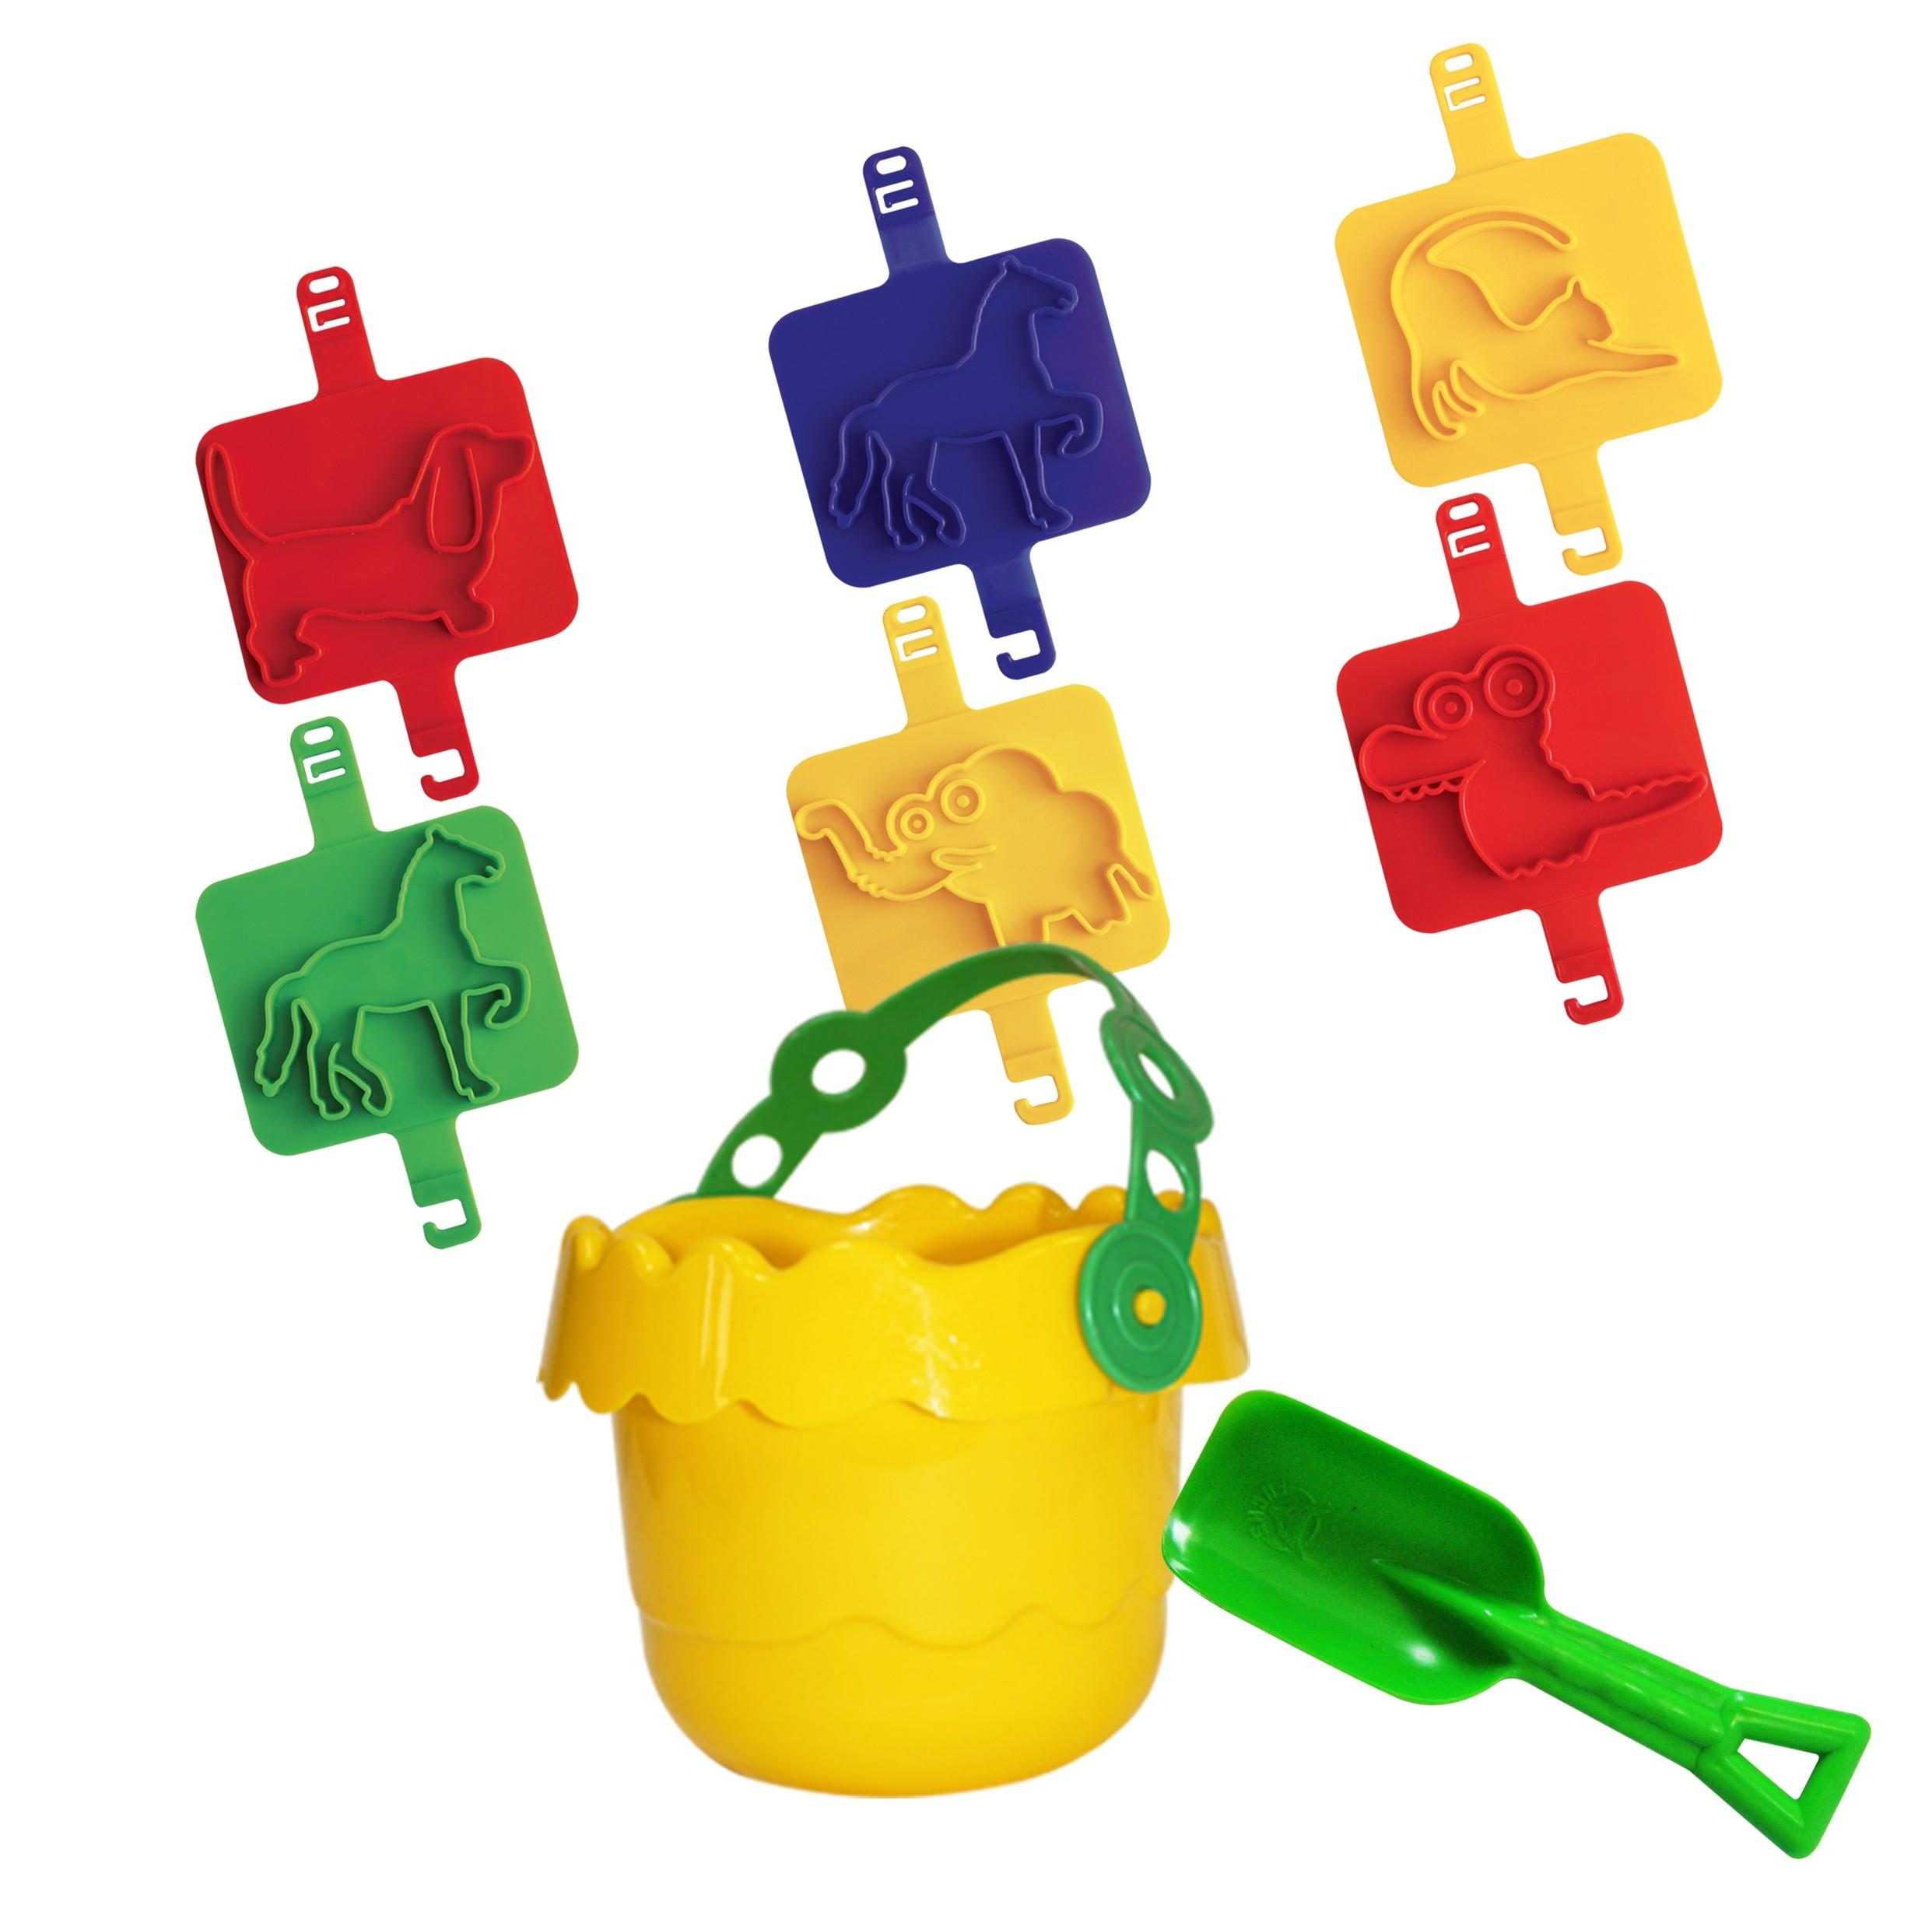 Игрушки для песка Пластмастер Картинки на песке N3 игрушки для песка пластмастер африка